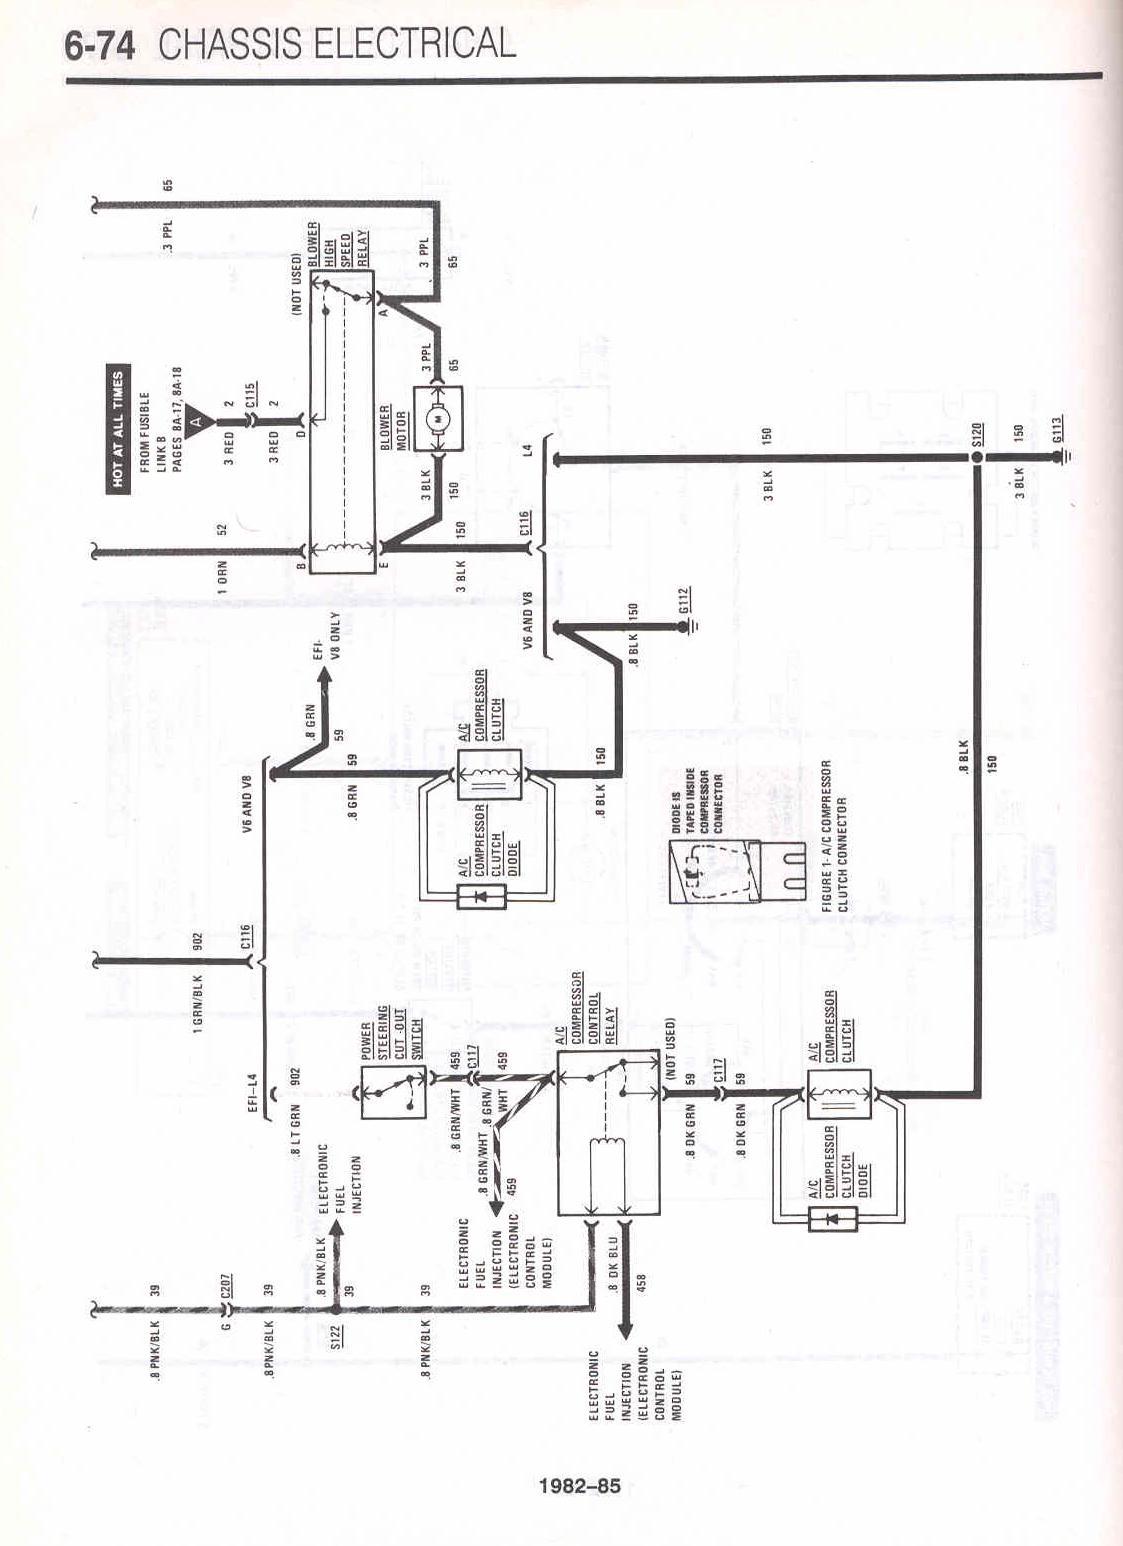 91 Firebird Ecm Wiring Diagram, 91, Free Engine Image For